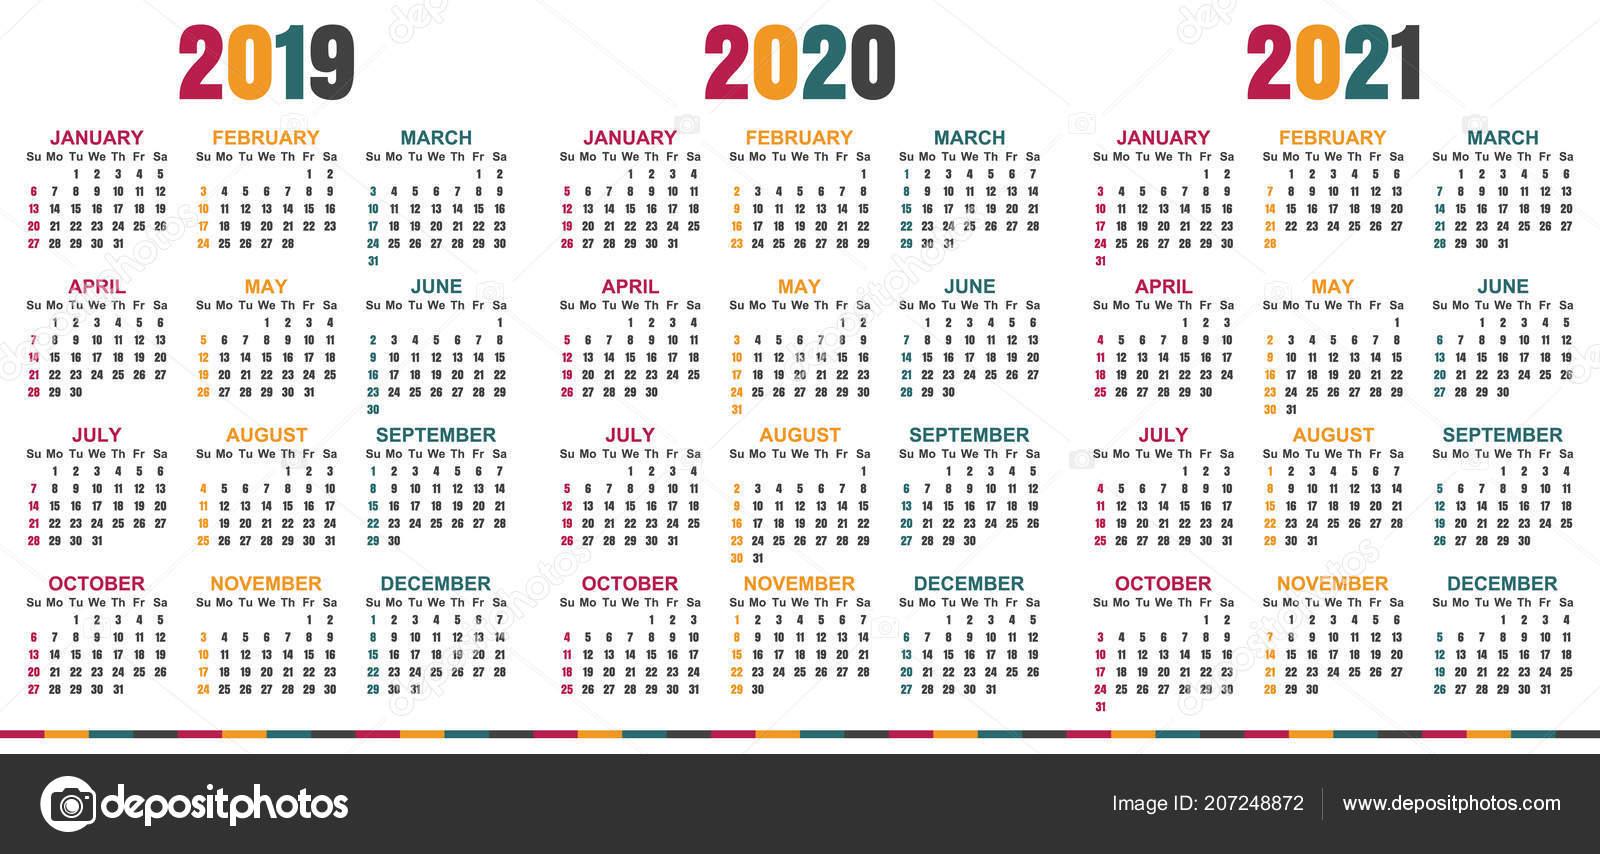 Calendario Diario Para Imprimir 2019.Planificacion Calendario 2019 2021 Semana Comienza Domingo